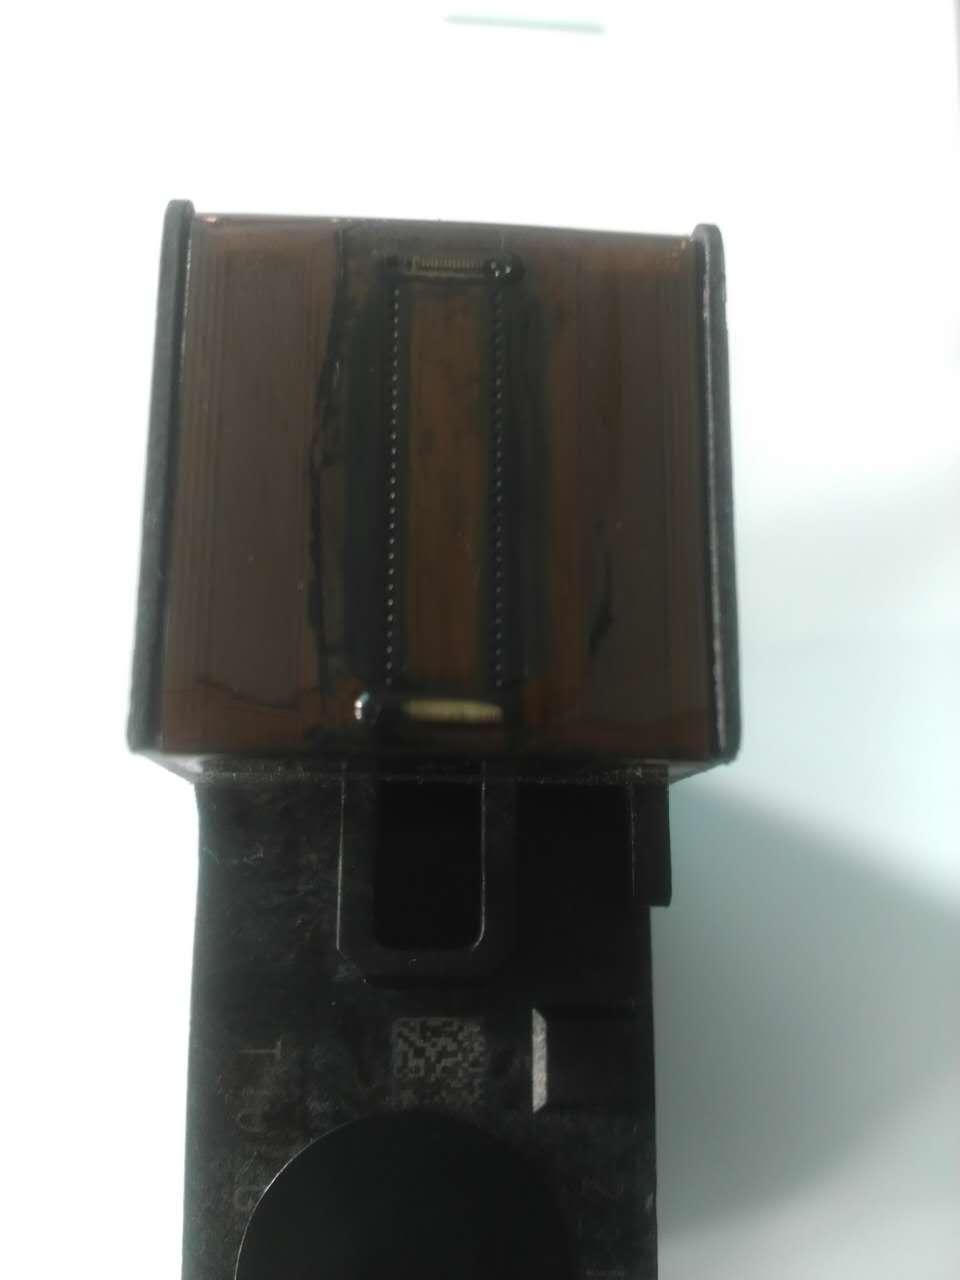 HP45溶剂快干HP2580原装墨盒金属喷印 惠普溶剂墨盒快干墨盒HP2580